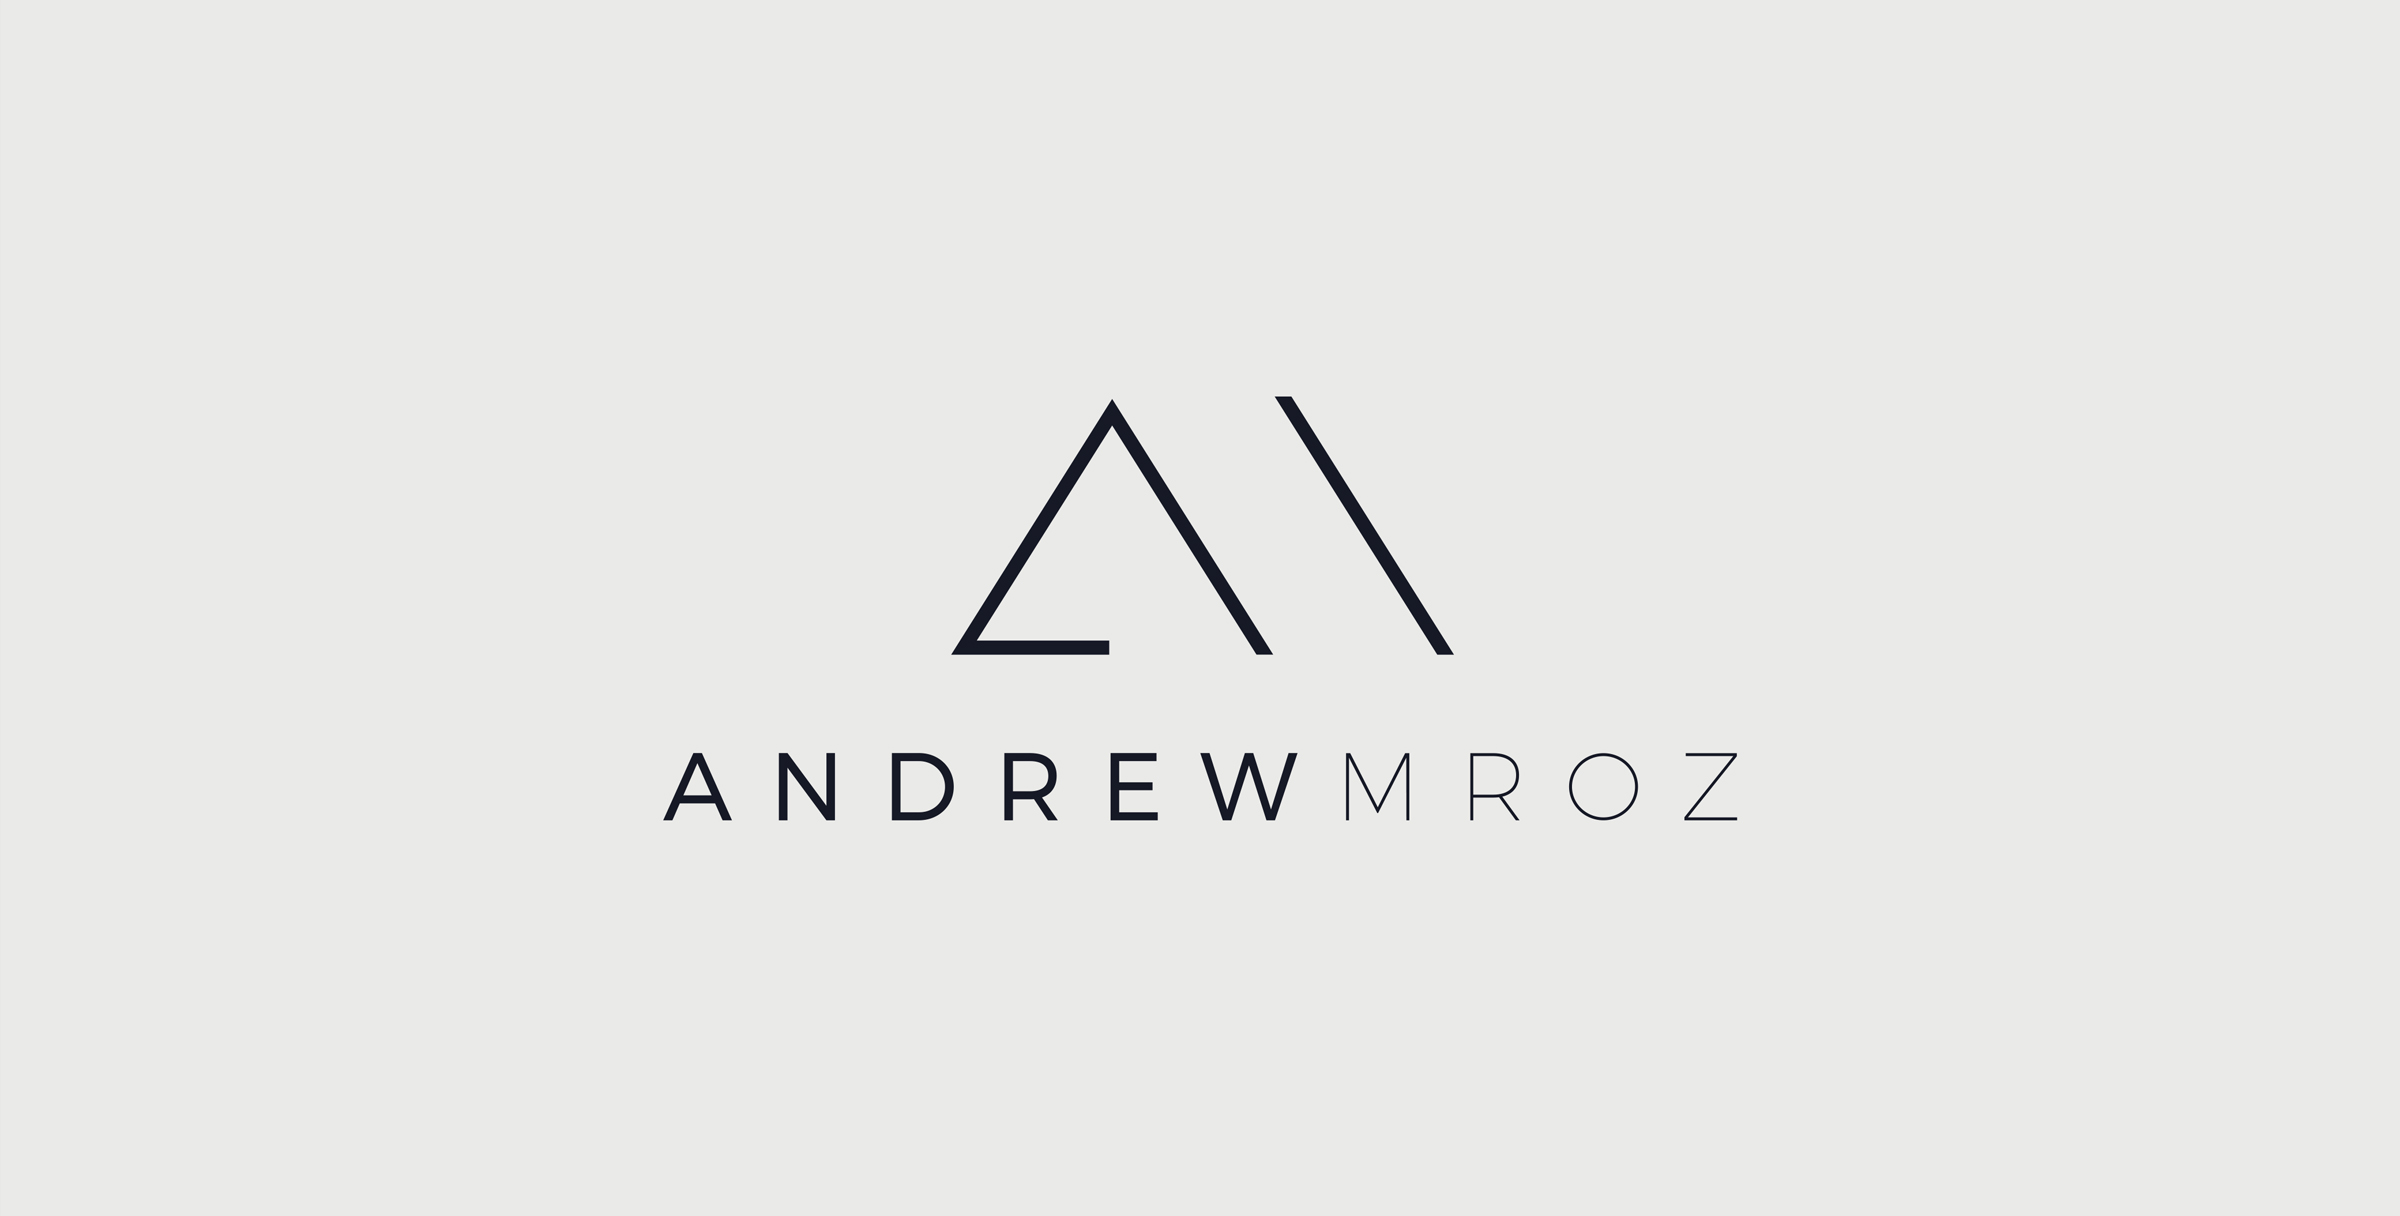 andrew-mroz-winnipeg-remax-branding-design-clover-and-crow